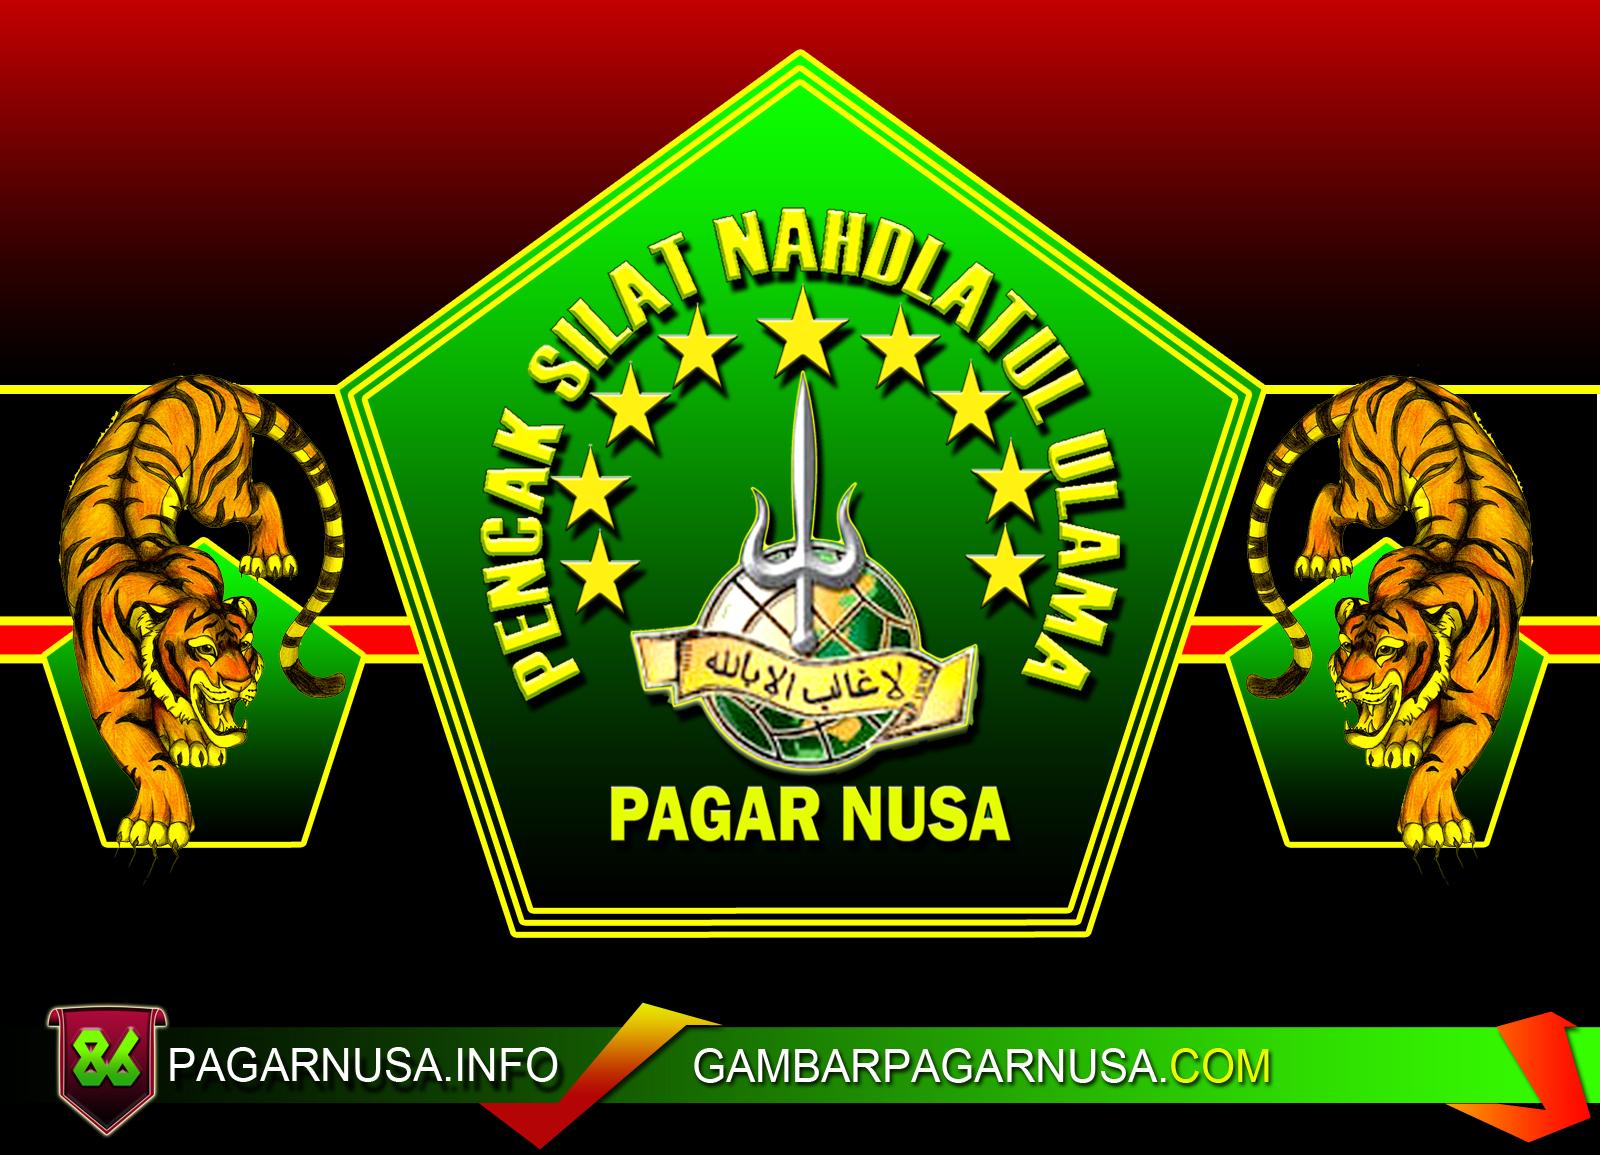 Gambar Kata Kata Pagar Nusa Sobkatakata